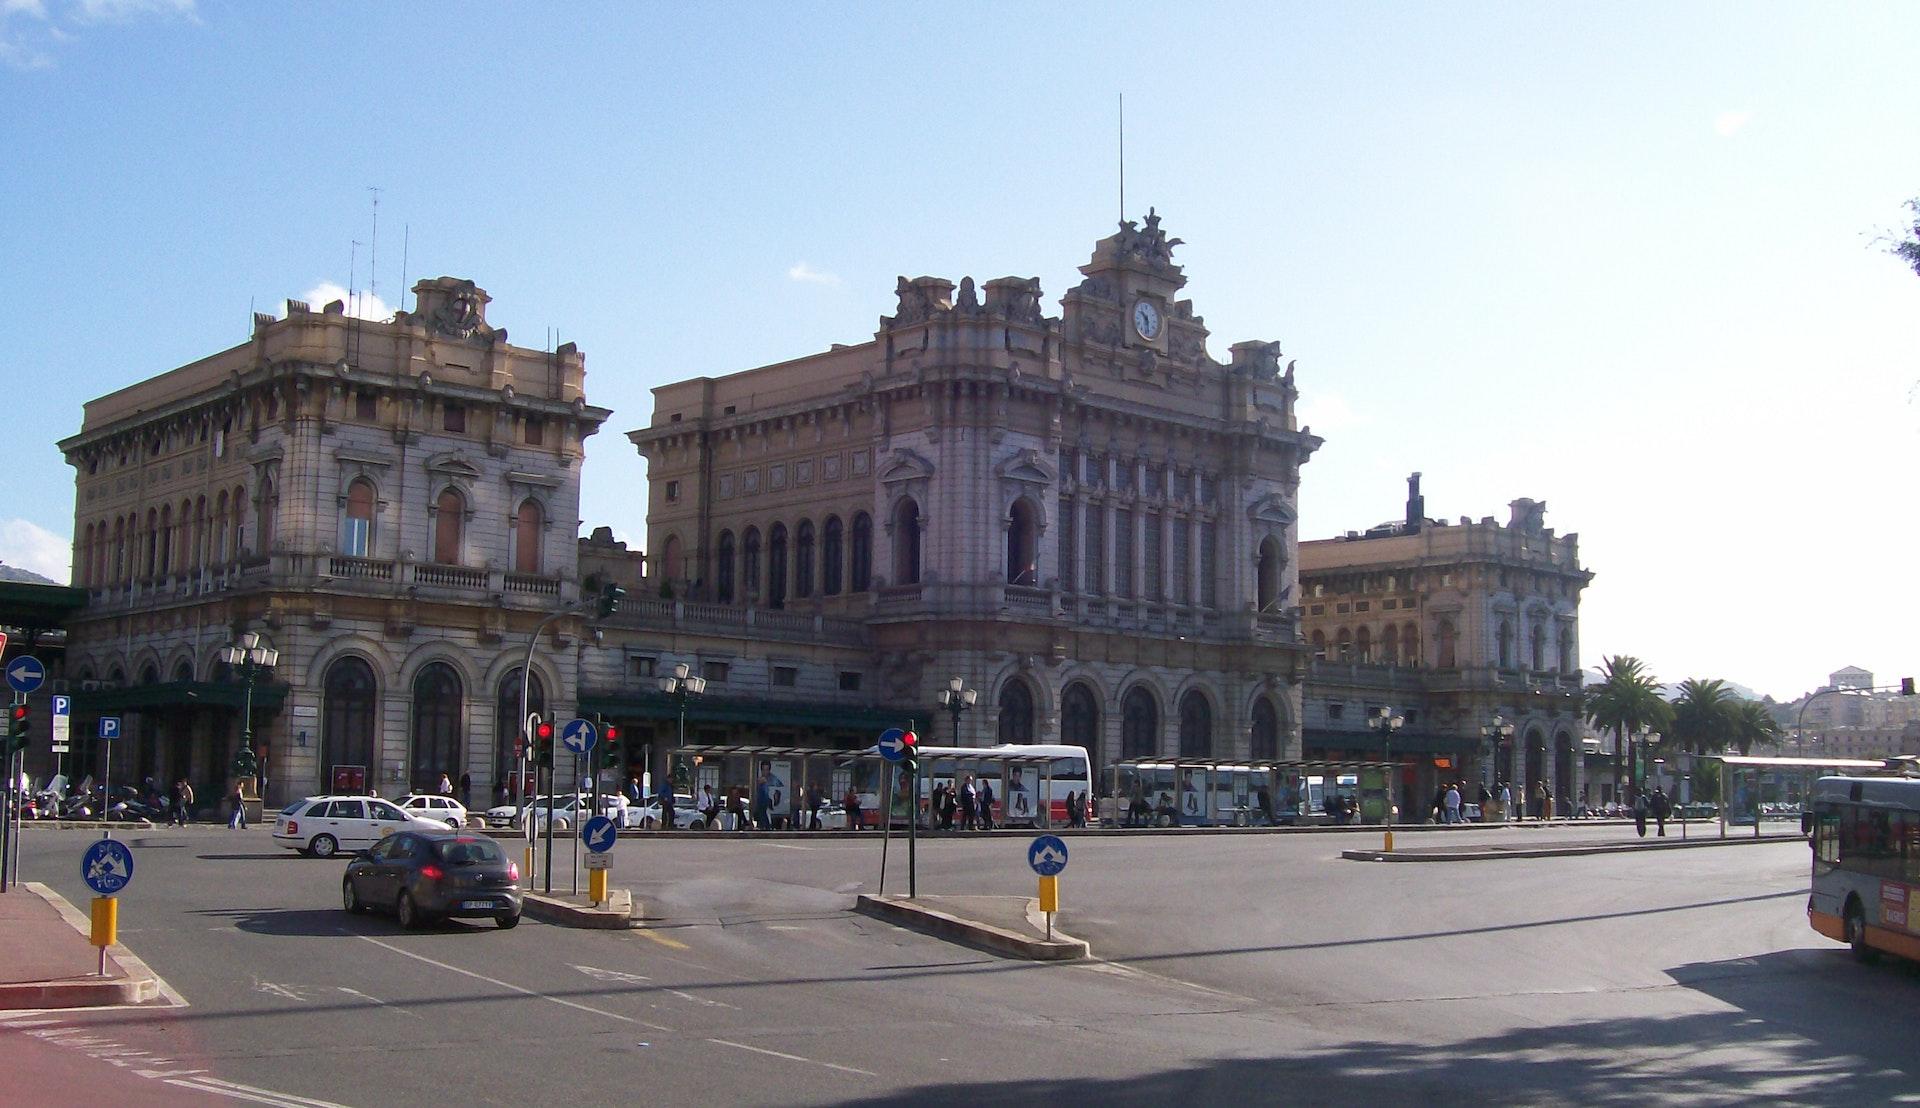 Genova Brignole togstasjon © Michele.V, Wikimedia Commons